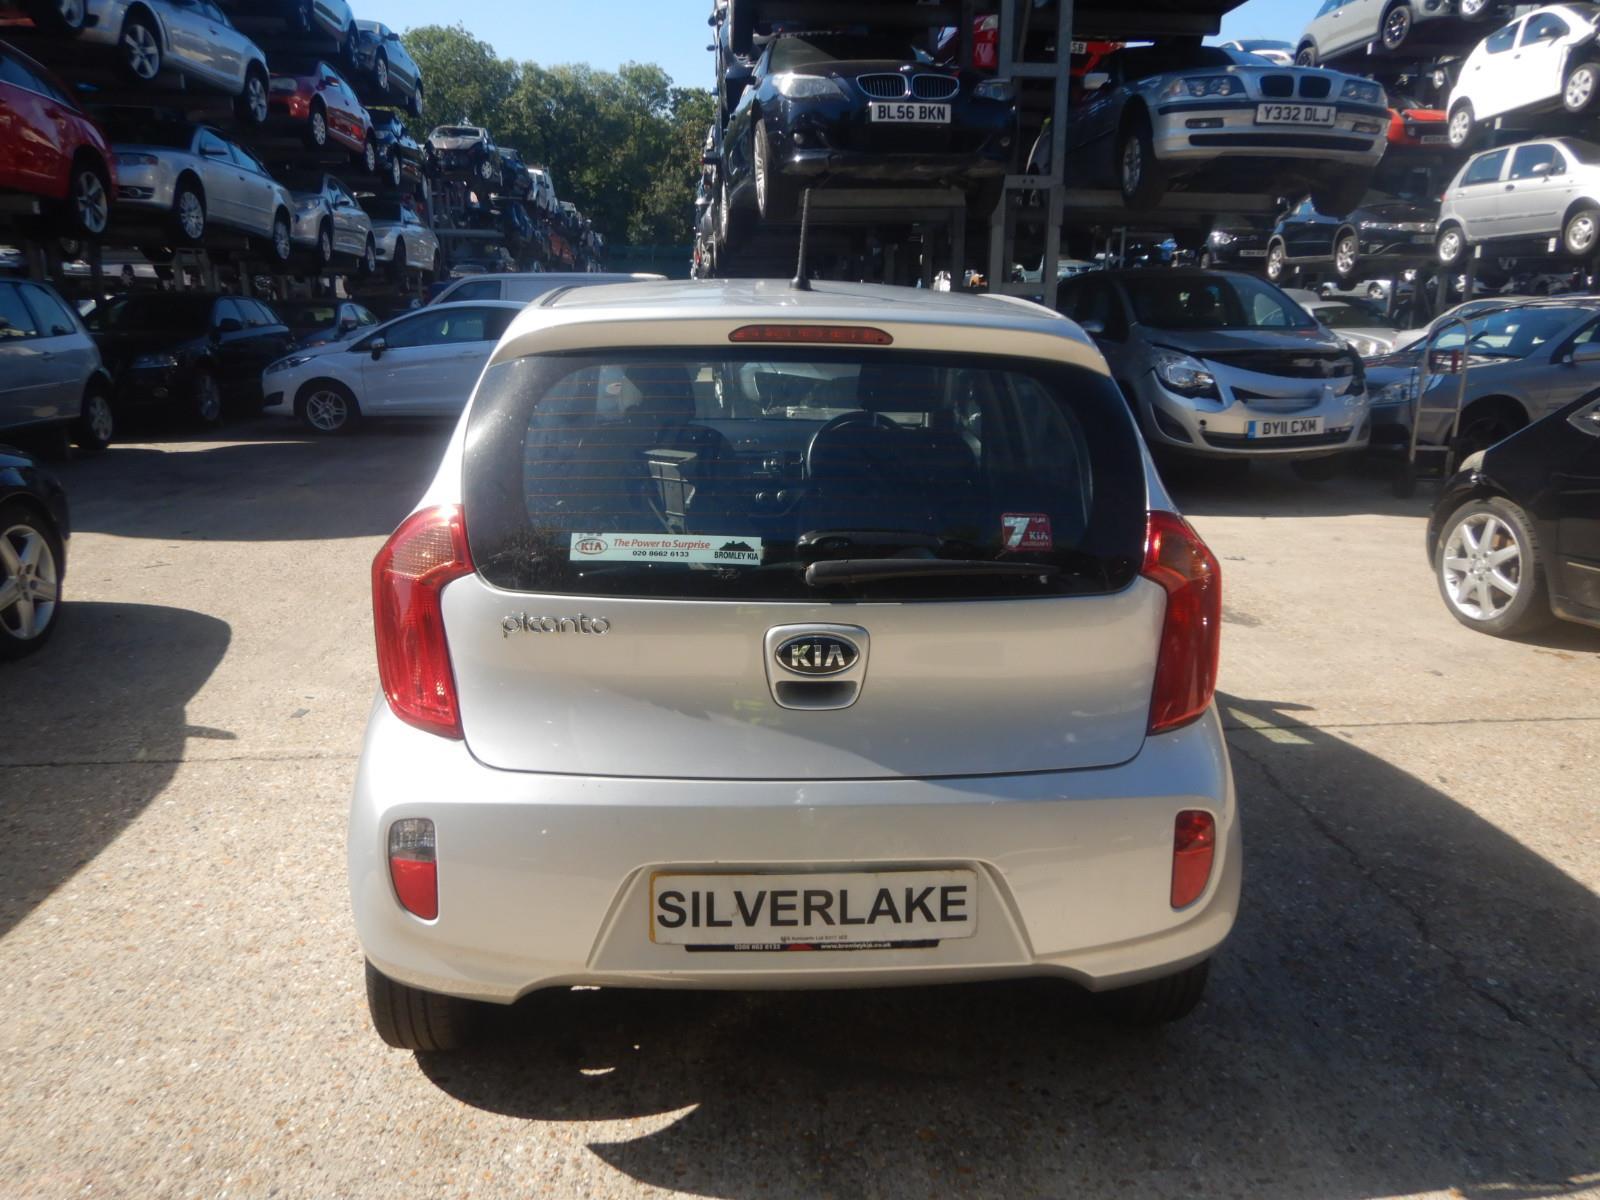 Kia Picanto 2011 To 2015 2 5 Door Hatchback Scrap Salvage Car Mentor Fuse Box For Sale Auction Silverlake Autoparts